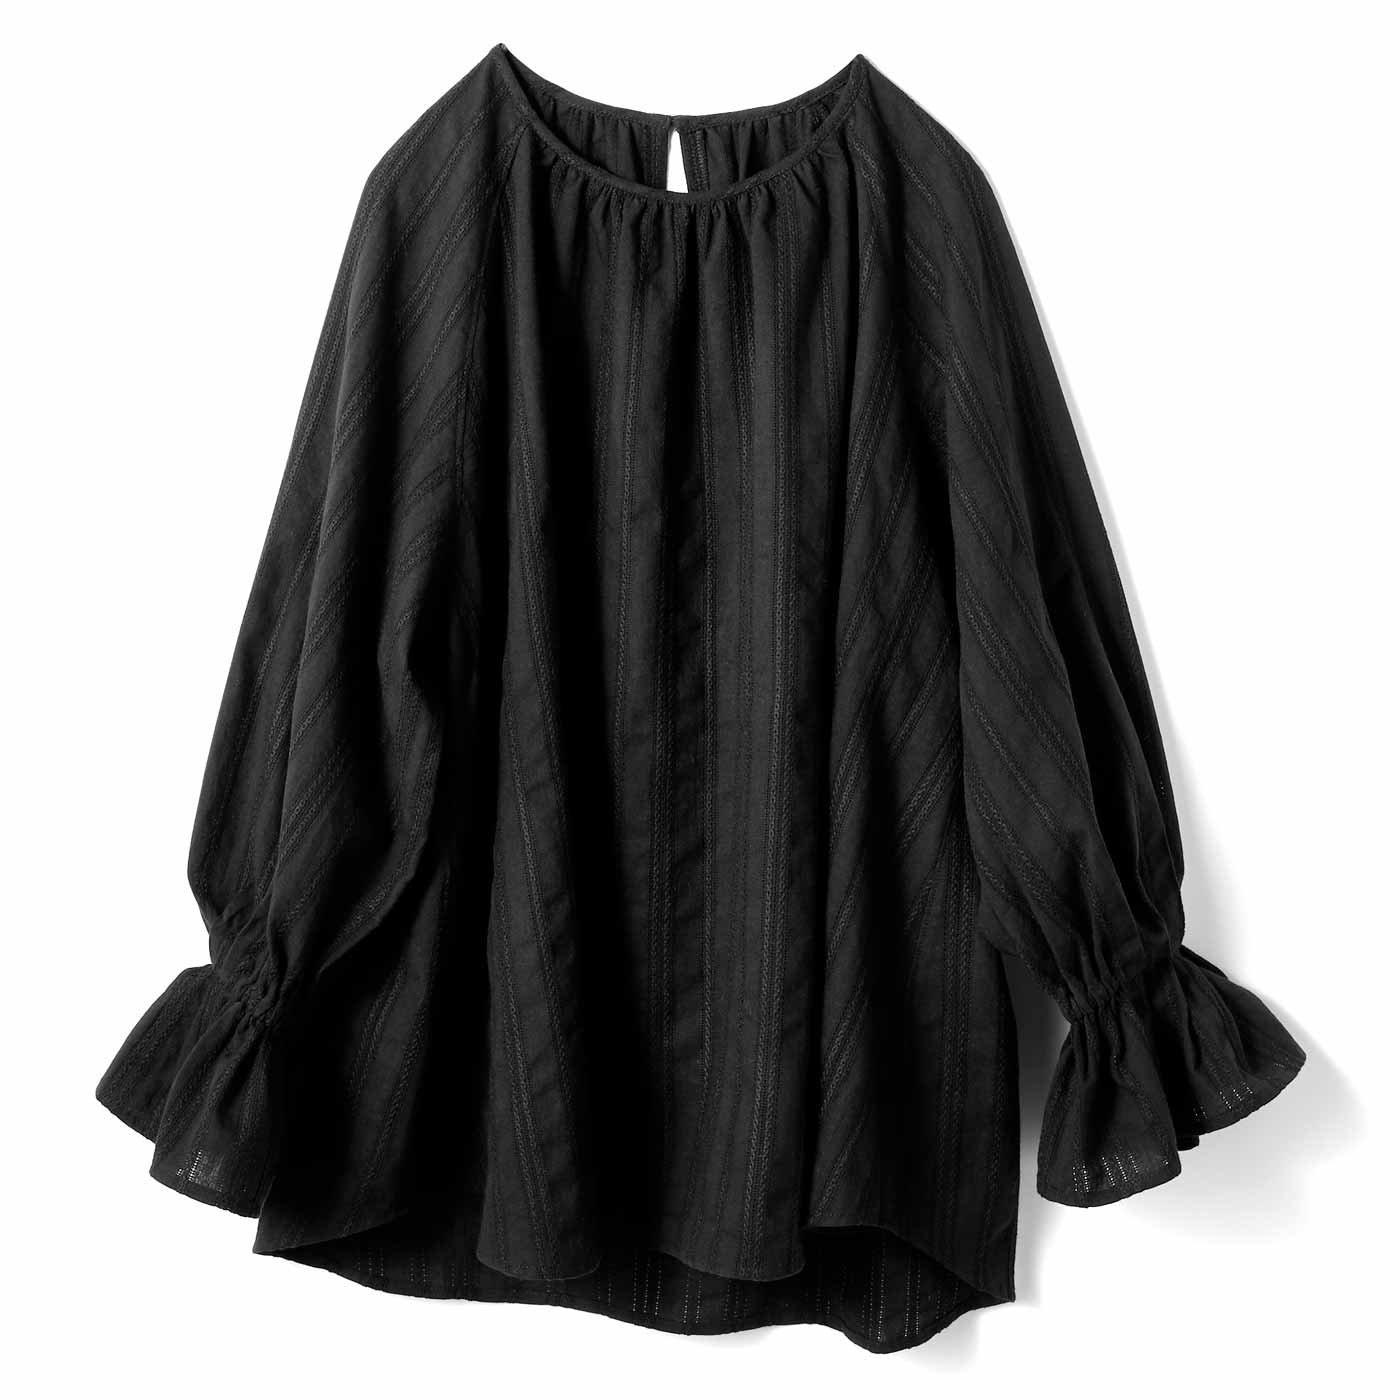 IEDIT[イディット] 繊細コットン素材のロングプルオーバー〈ブラック〉